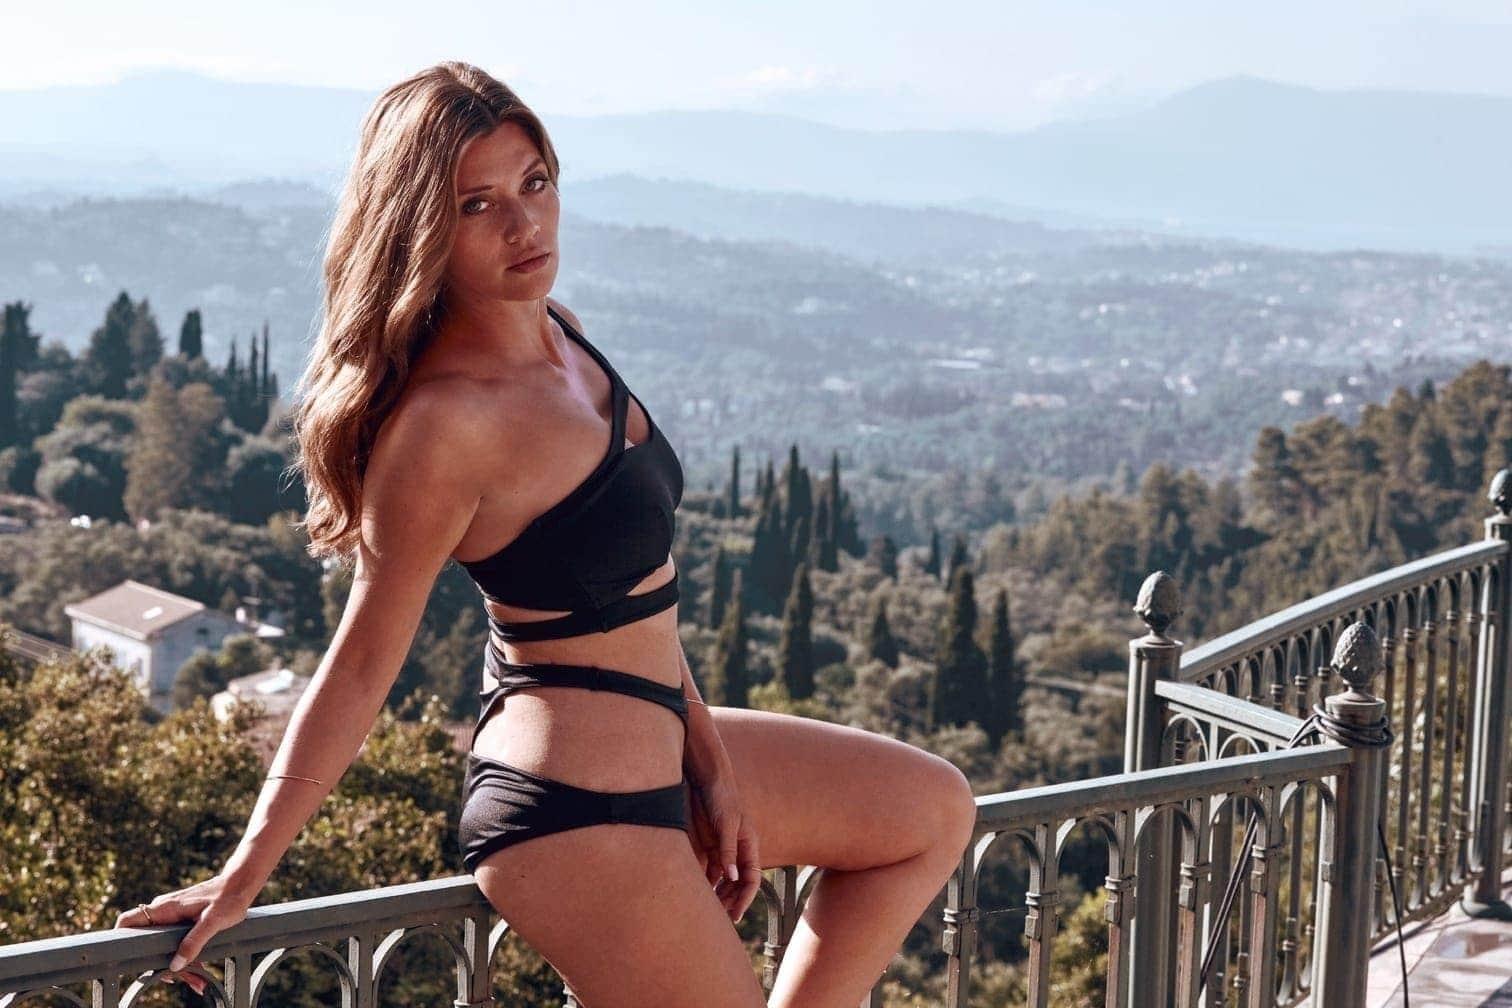 <p>Nadine Klein ist die neue Bachelorette.</p> Foto: MG RTL D / Arya Shirazi